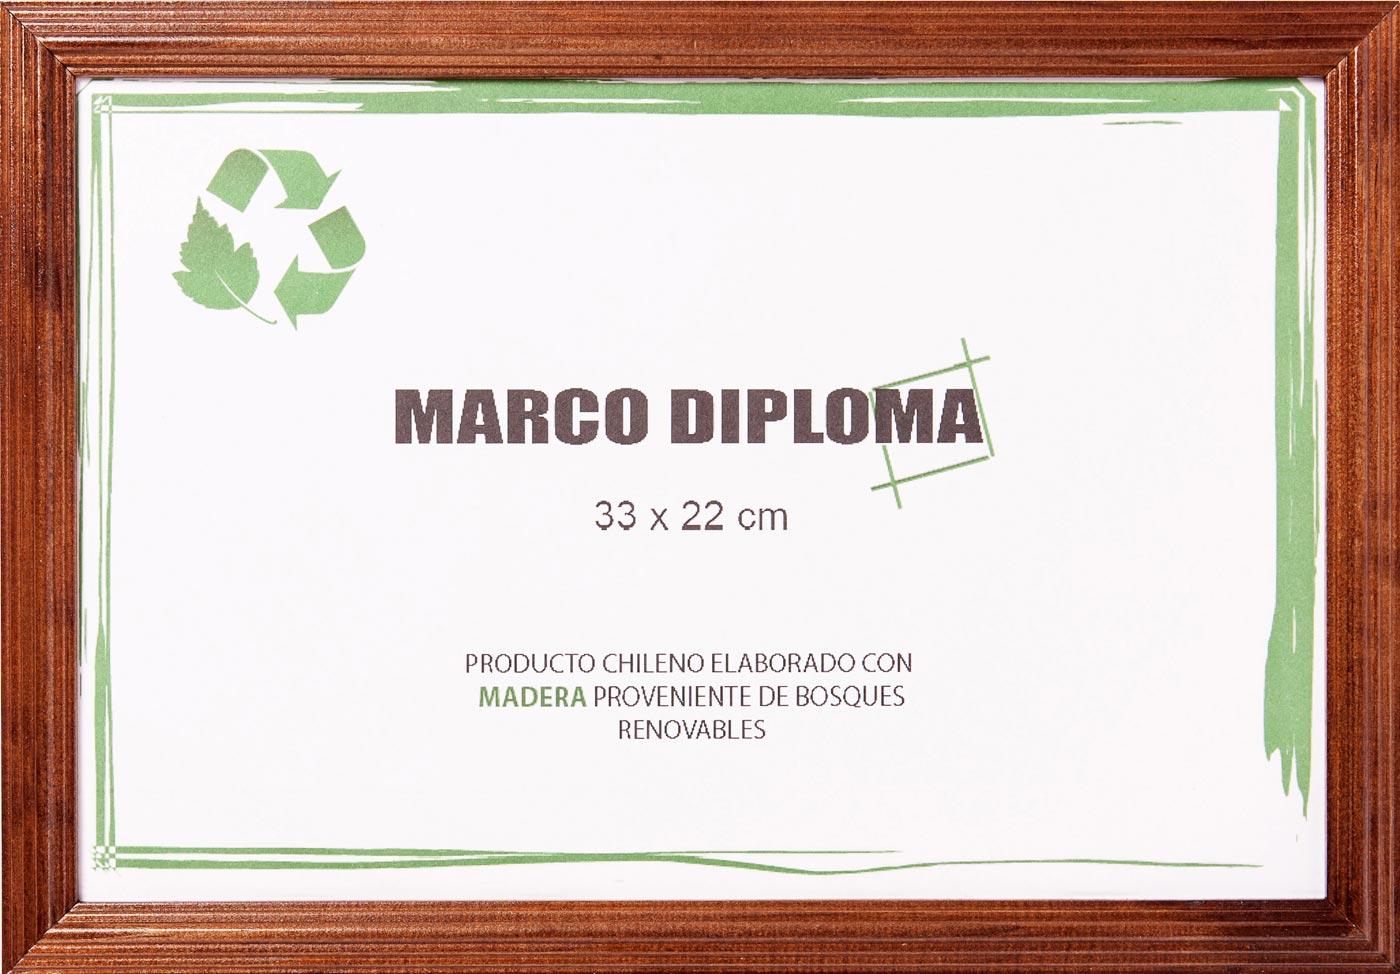 marco_diploma_1004_nogal